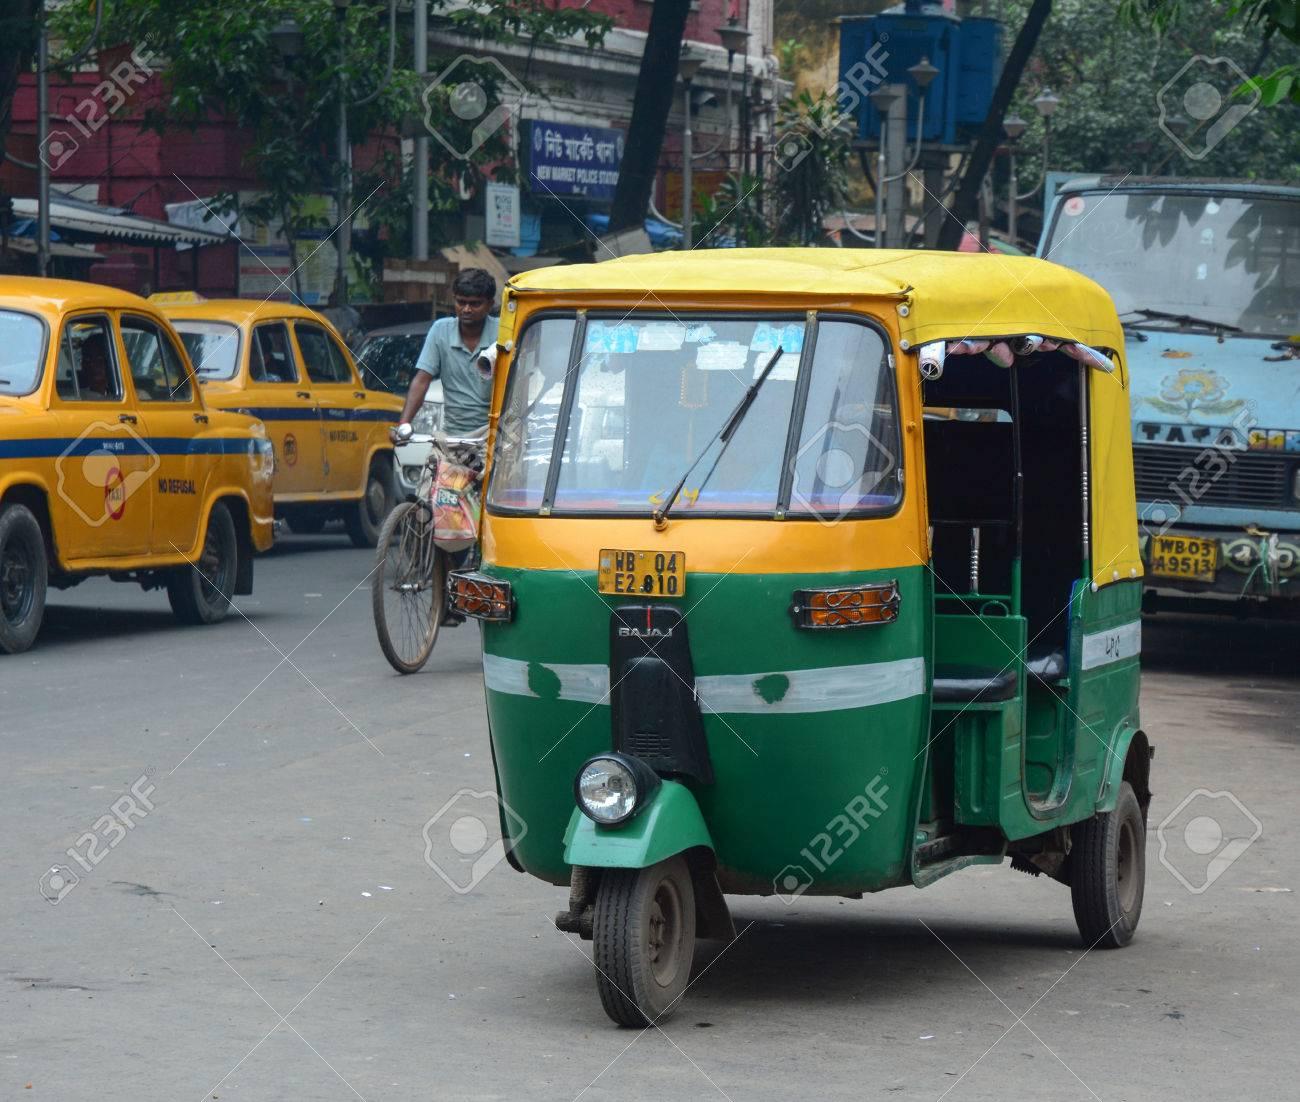 kolkata india jul 8 2015 private auto rickshaw three weeler